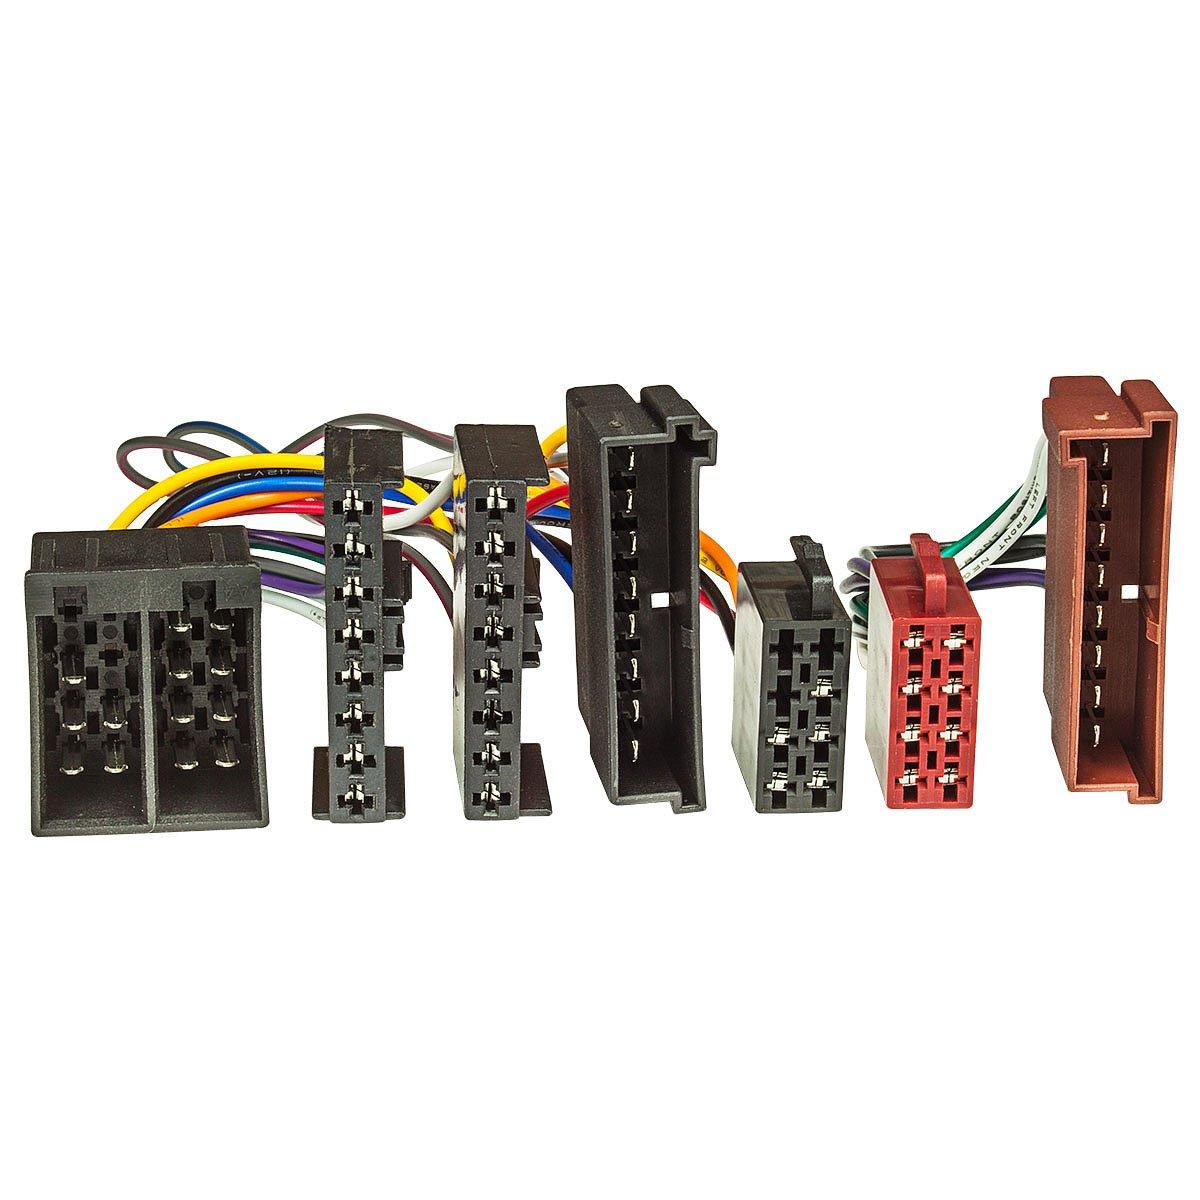 ISO x Adaptador (T-cable) FORD hasta 2004 para manos libres con ISO-conexió n (como. Parrot, THB, Funkwerk dabendorf) tomzz Audio ® 7315-000